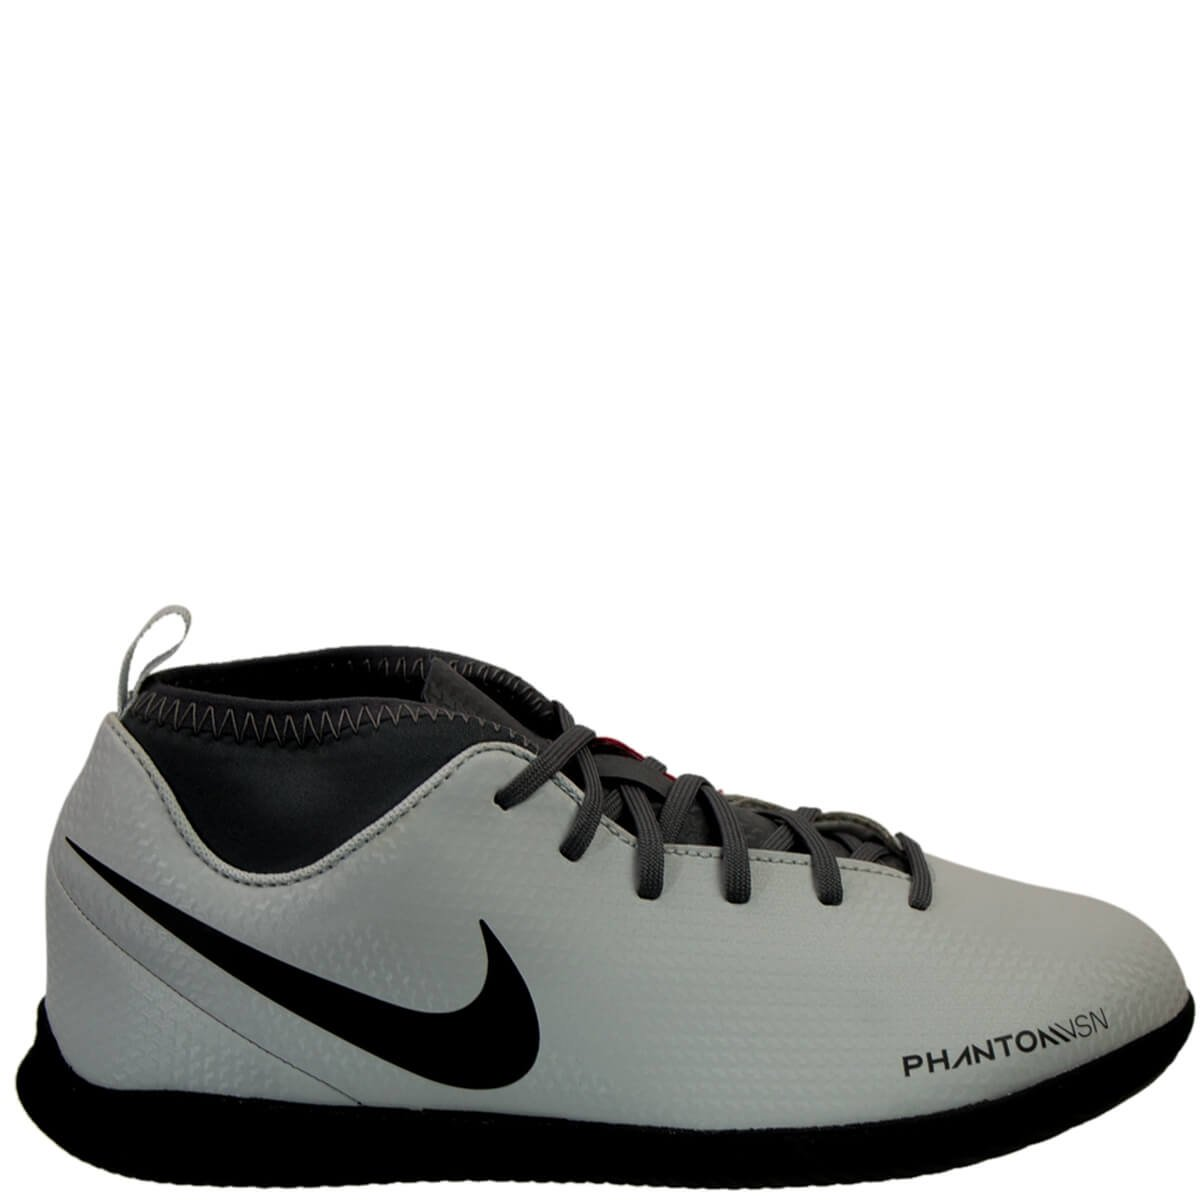 732f569ebe Bizz Store - Chuteira Futsal Infantil Nike Phantom Vision Club